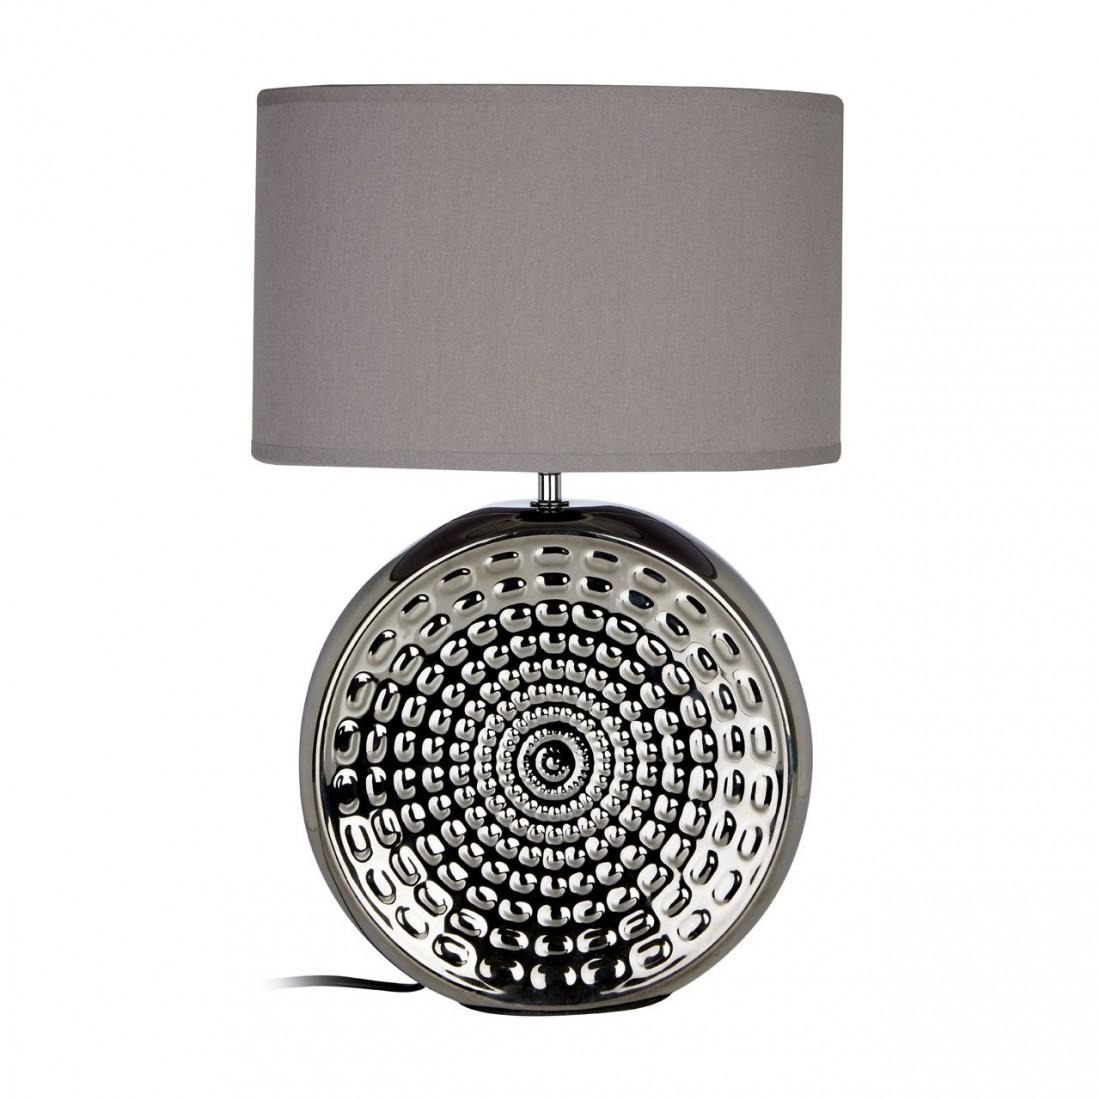 Kensington - Win stolní lampa